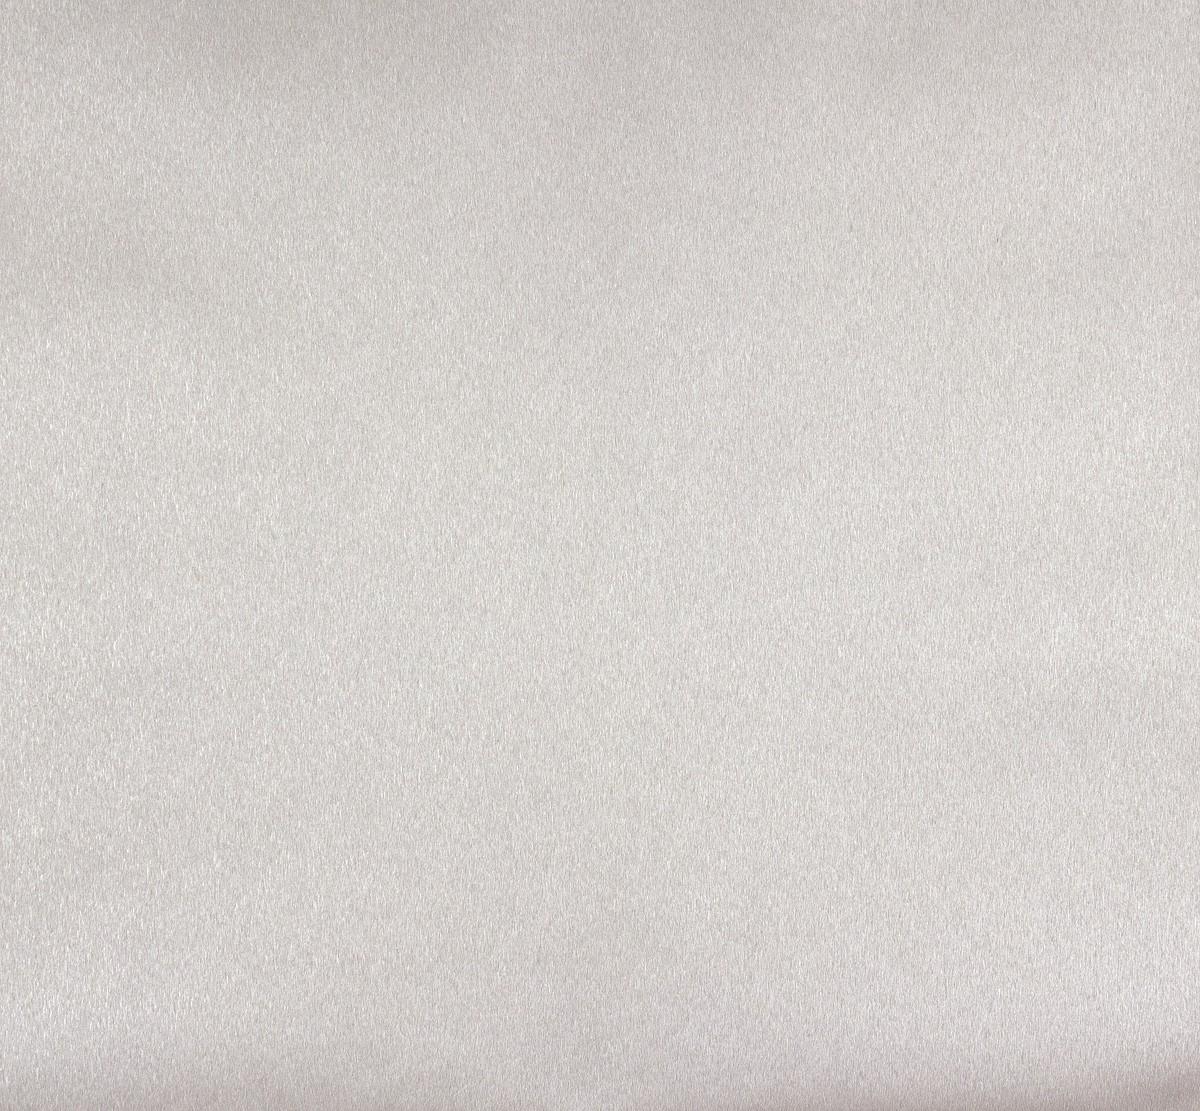 Porsche design tapete grau silber einfarbig 3117 64 for Design tapete grau